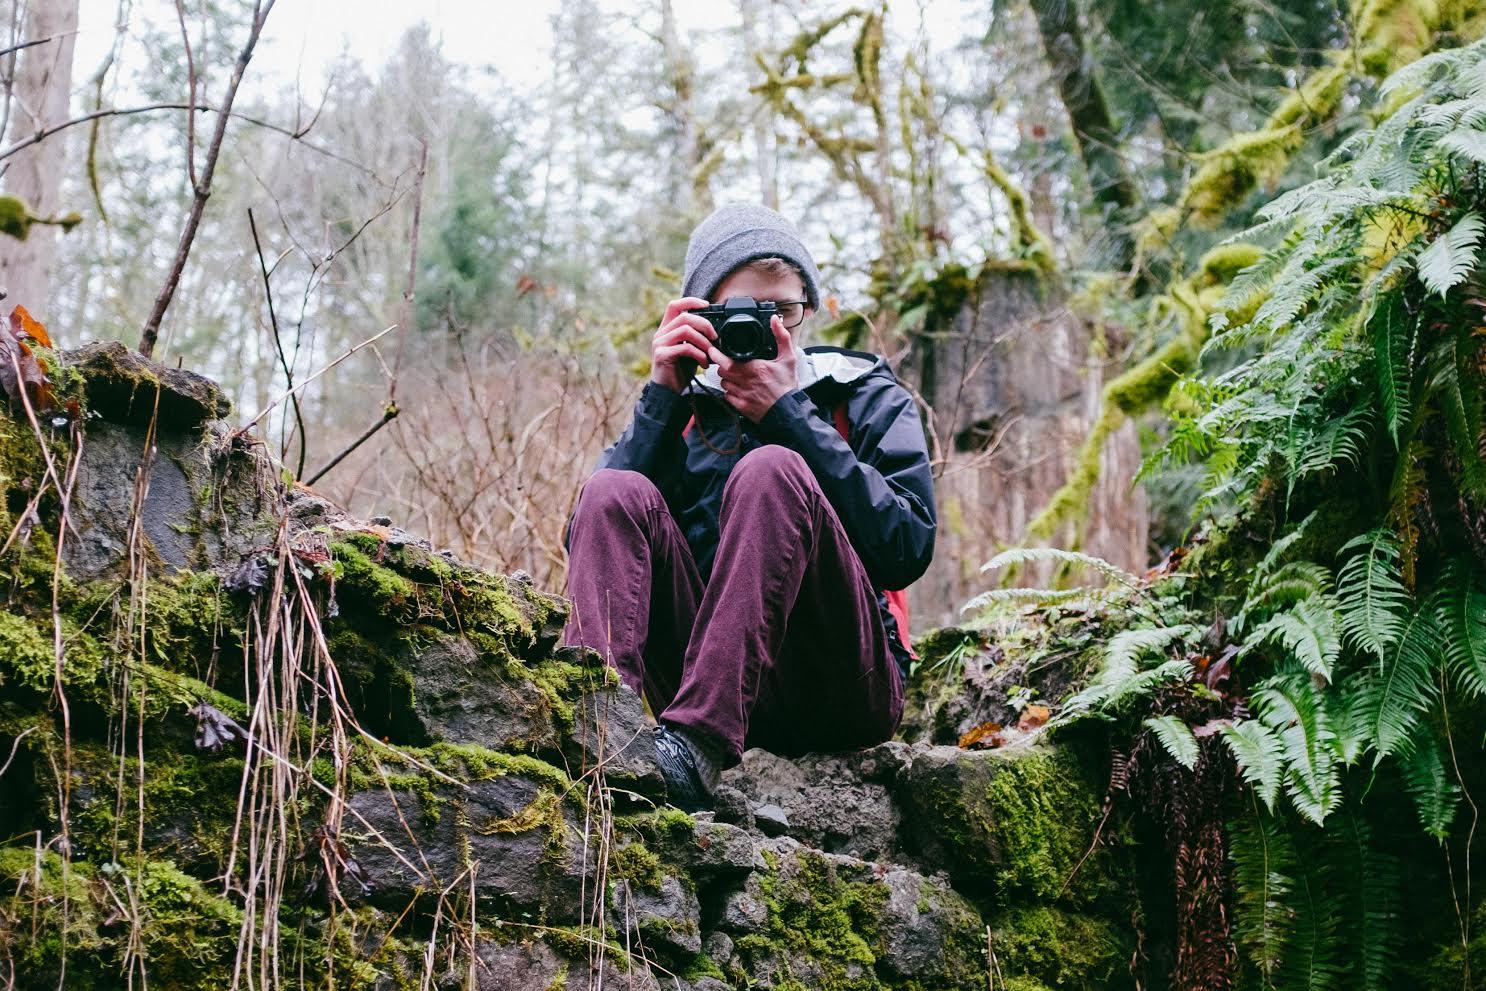 M Agency videographer Nate Richholt